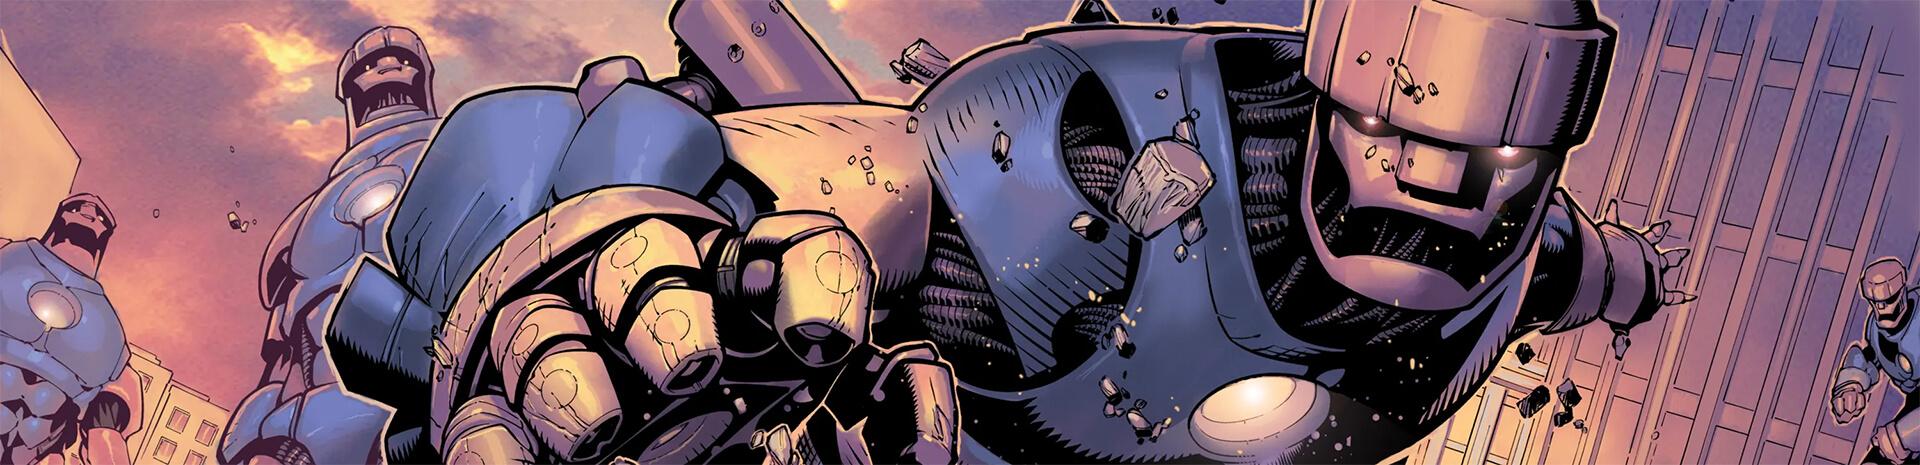 Centinela Marvel X-Men, imagen de los cómics